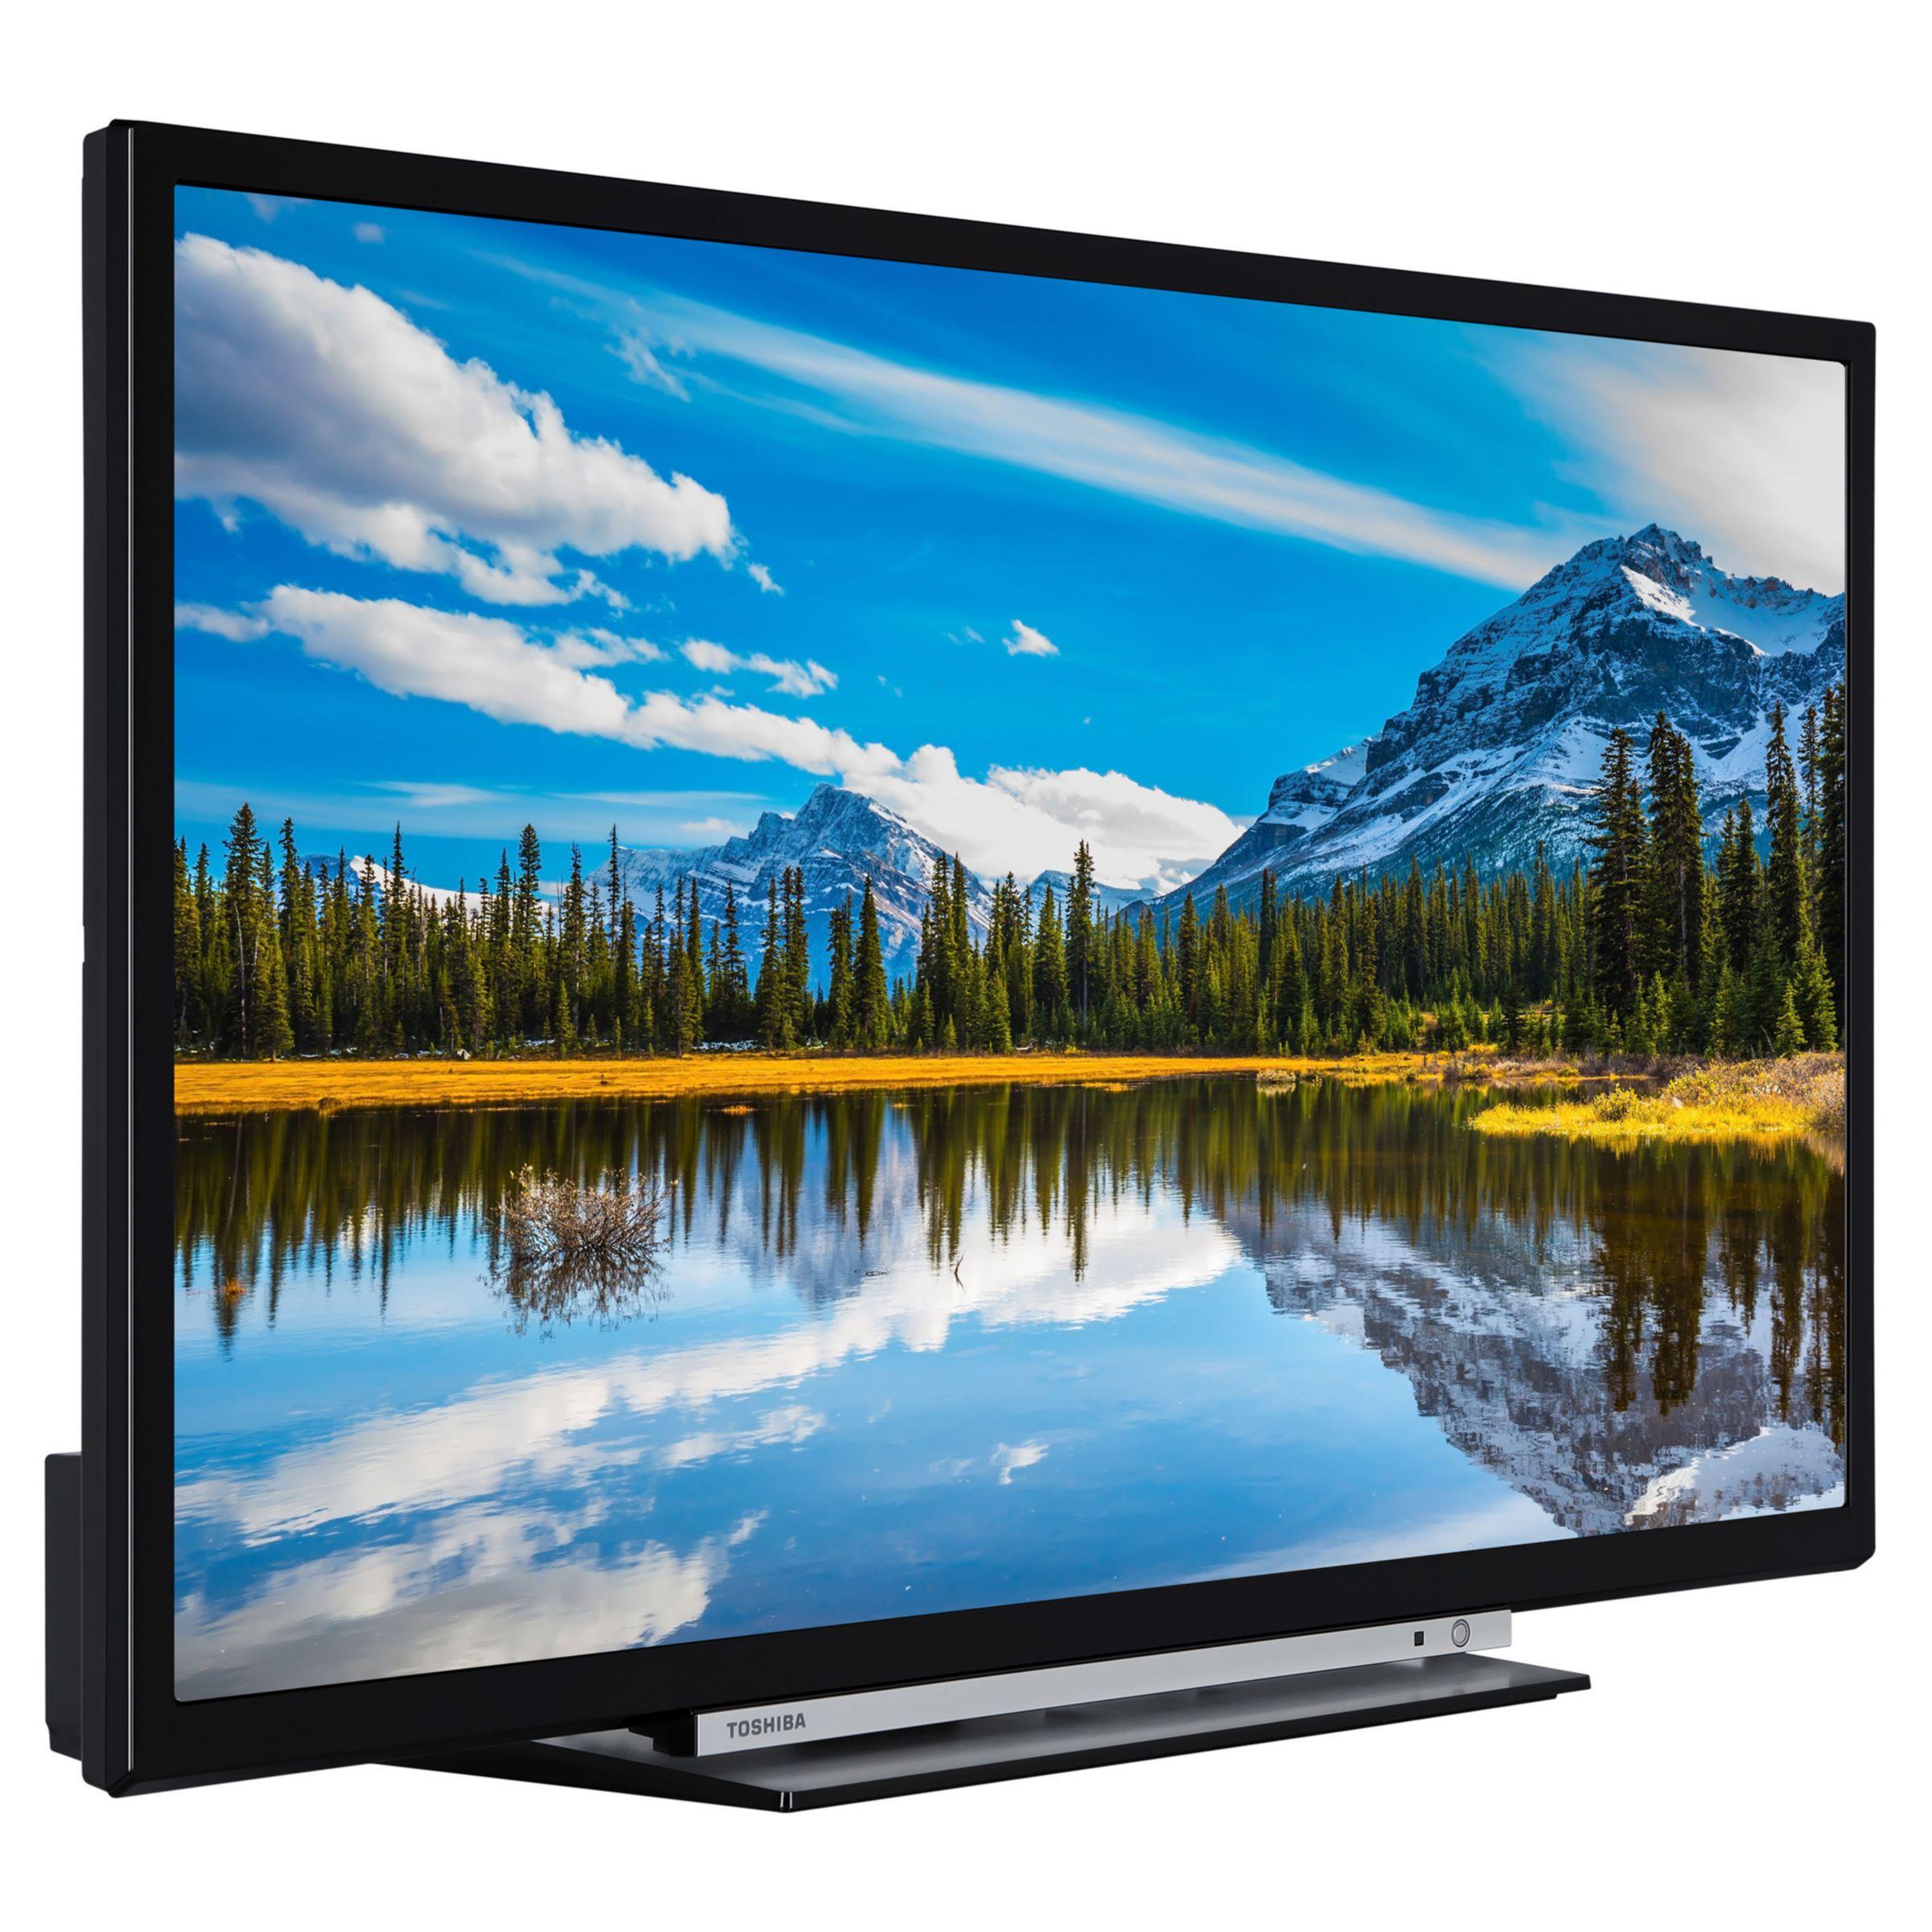 "Toshiba 32L3863DB LED Full HD 1080p 32"" Smart TV - £179 @ John Lewis & Partners - 5 year guarantee"